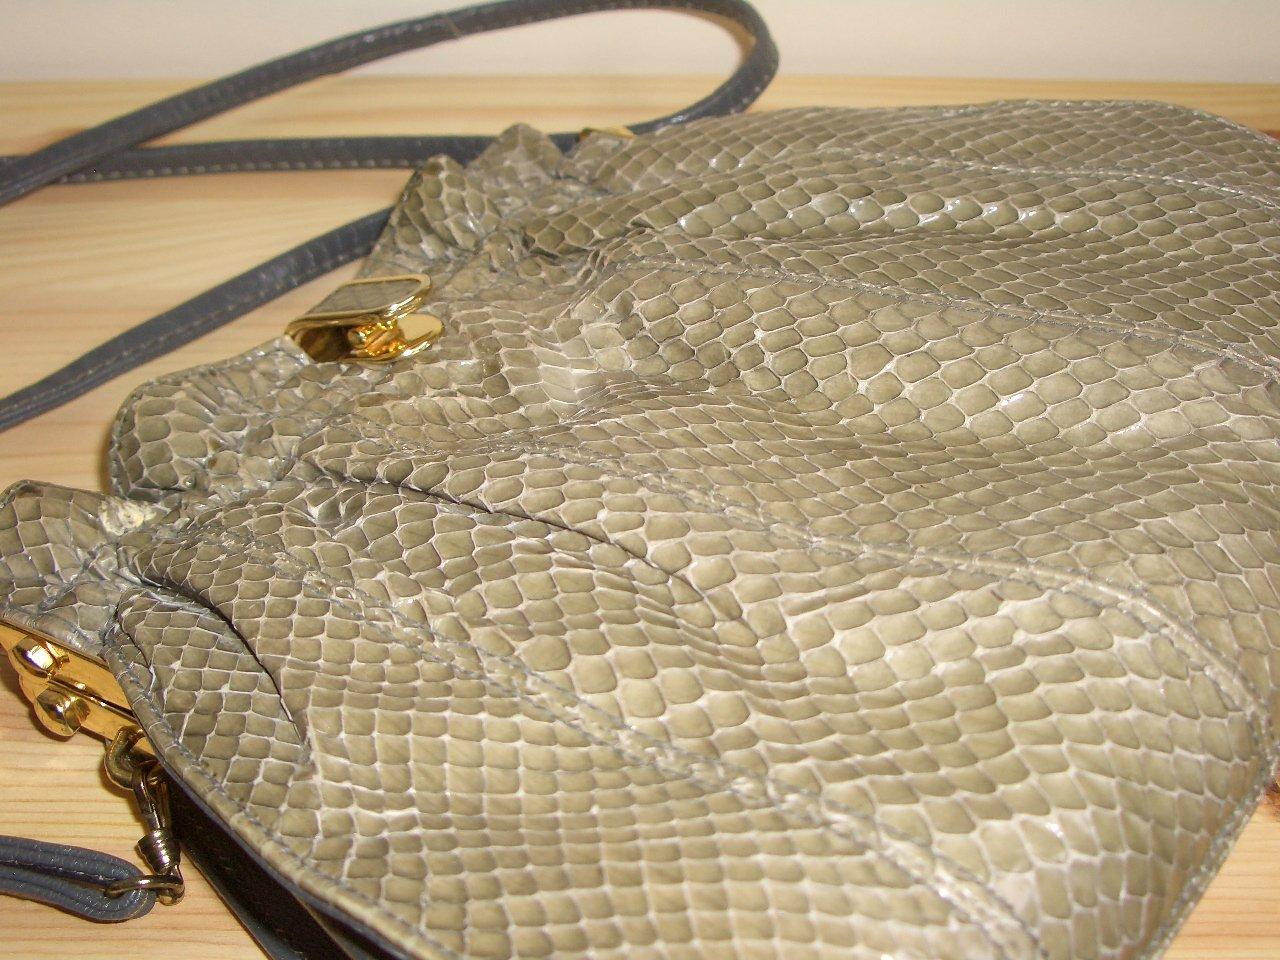 Retro 80s Grey Snakeskin Ruched Purse Vintage Mastercraft Gathered Glam Clutch Handbag Crossbody Bag